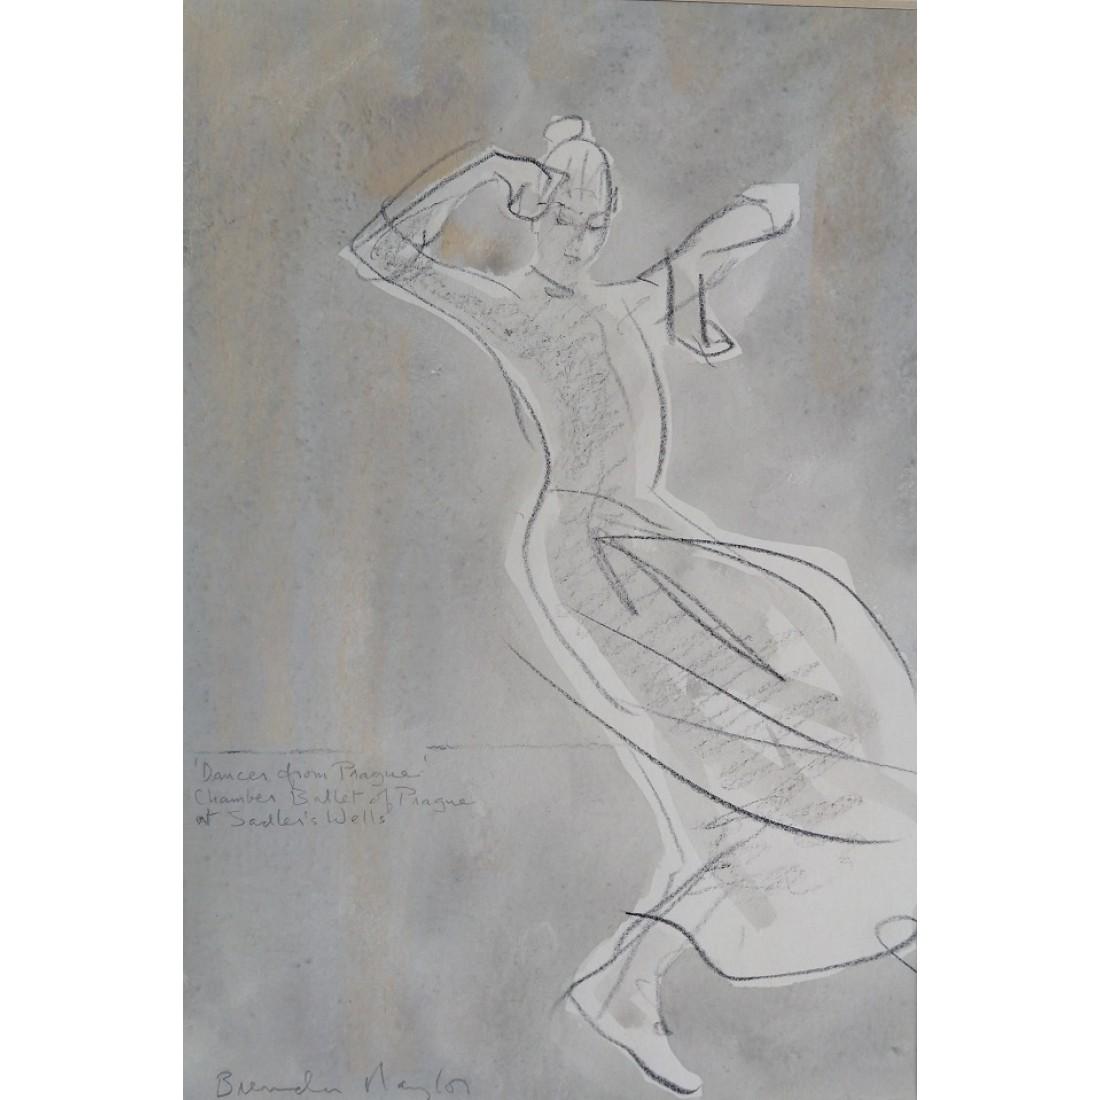 211 Dancer from Prague